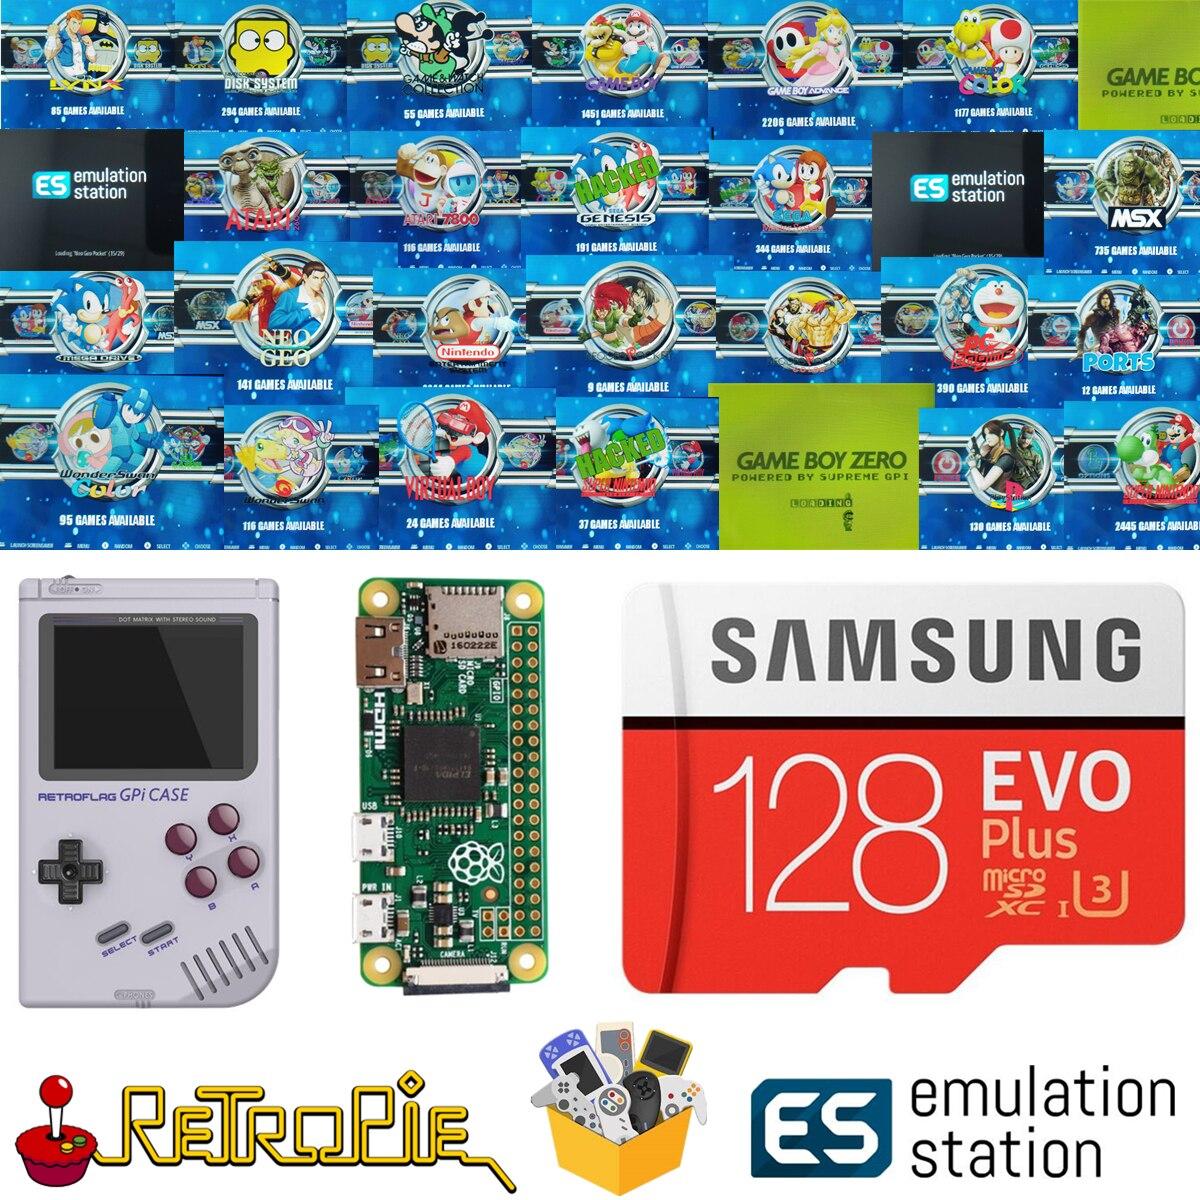 128 GB Retropie Emulation Station SD Card For Your GPi Case Raspberry Pi Zero 14000+ Games FC NES SNES GBA PS NEOGEO ATARI LYNX